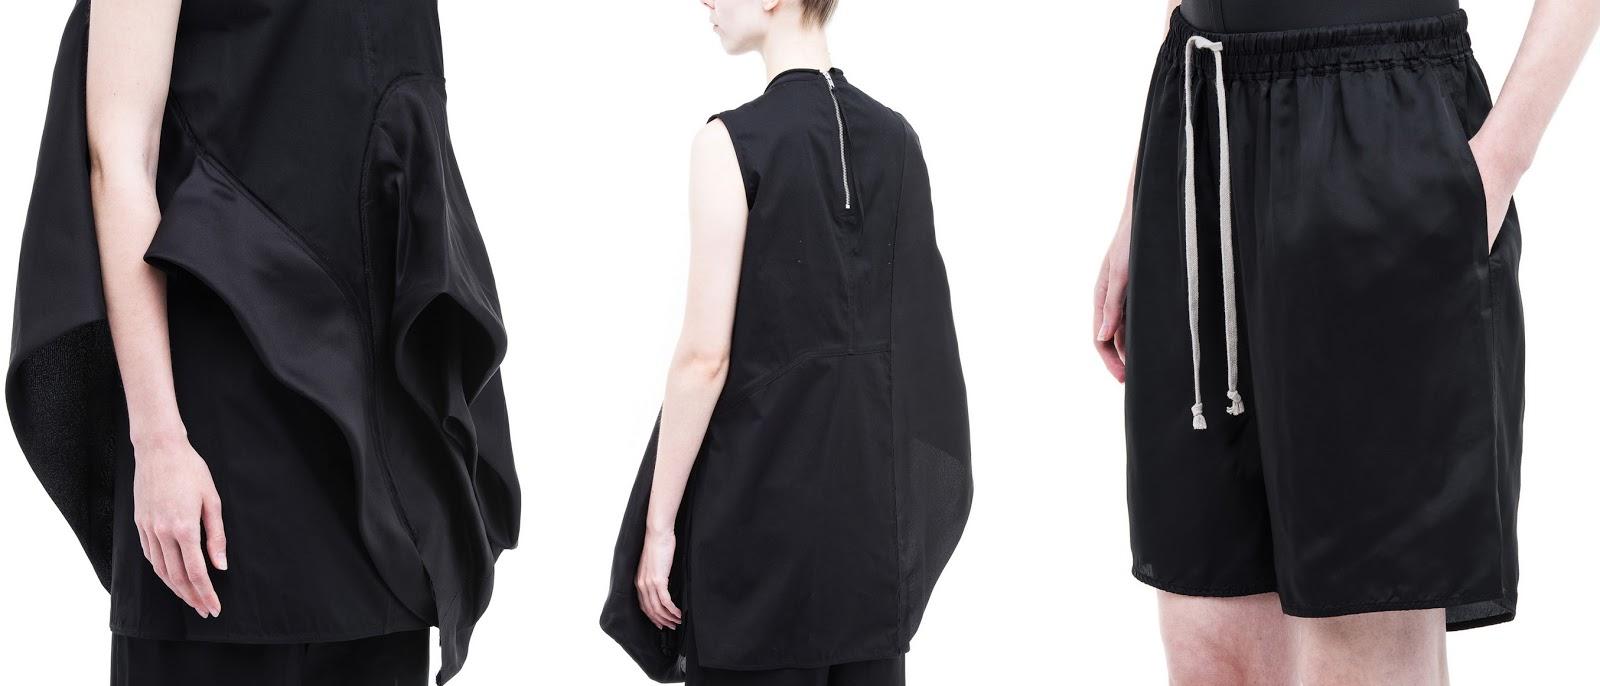 webshop fotografie kleding modellenwerk Milaan Rick Owens e-commerce